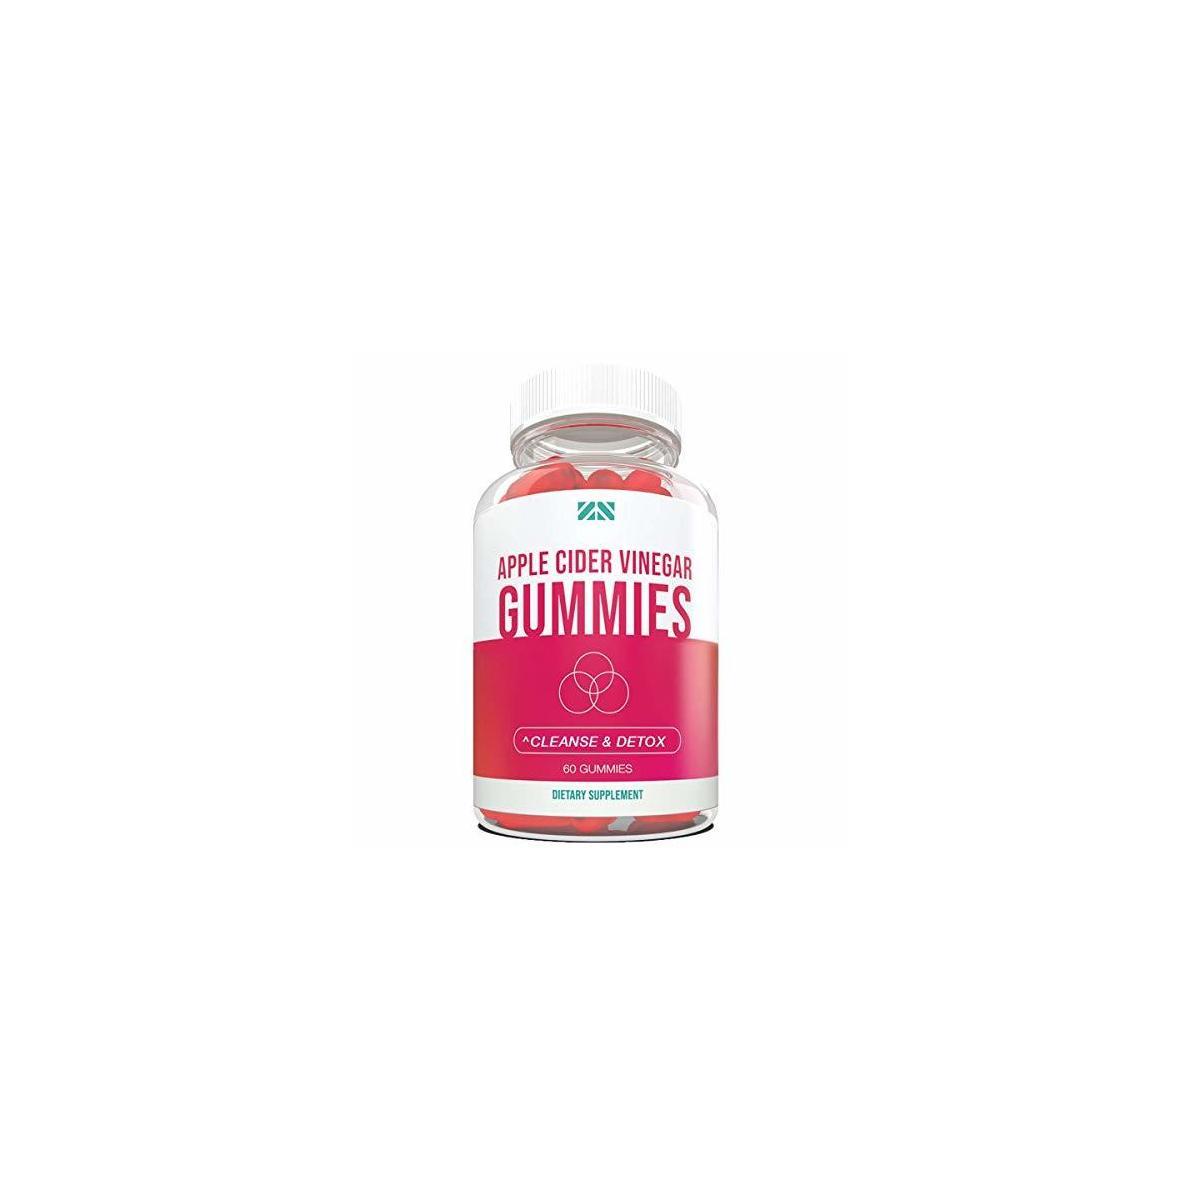 Apple Cider Vinegar Gummies - Detox, Cleanse, Weight Loss, Better Digestion, Healthy Heart Health, Balanced Blood Pressure - 60 Count